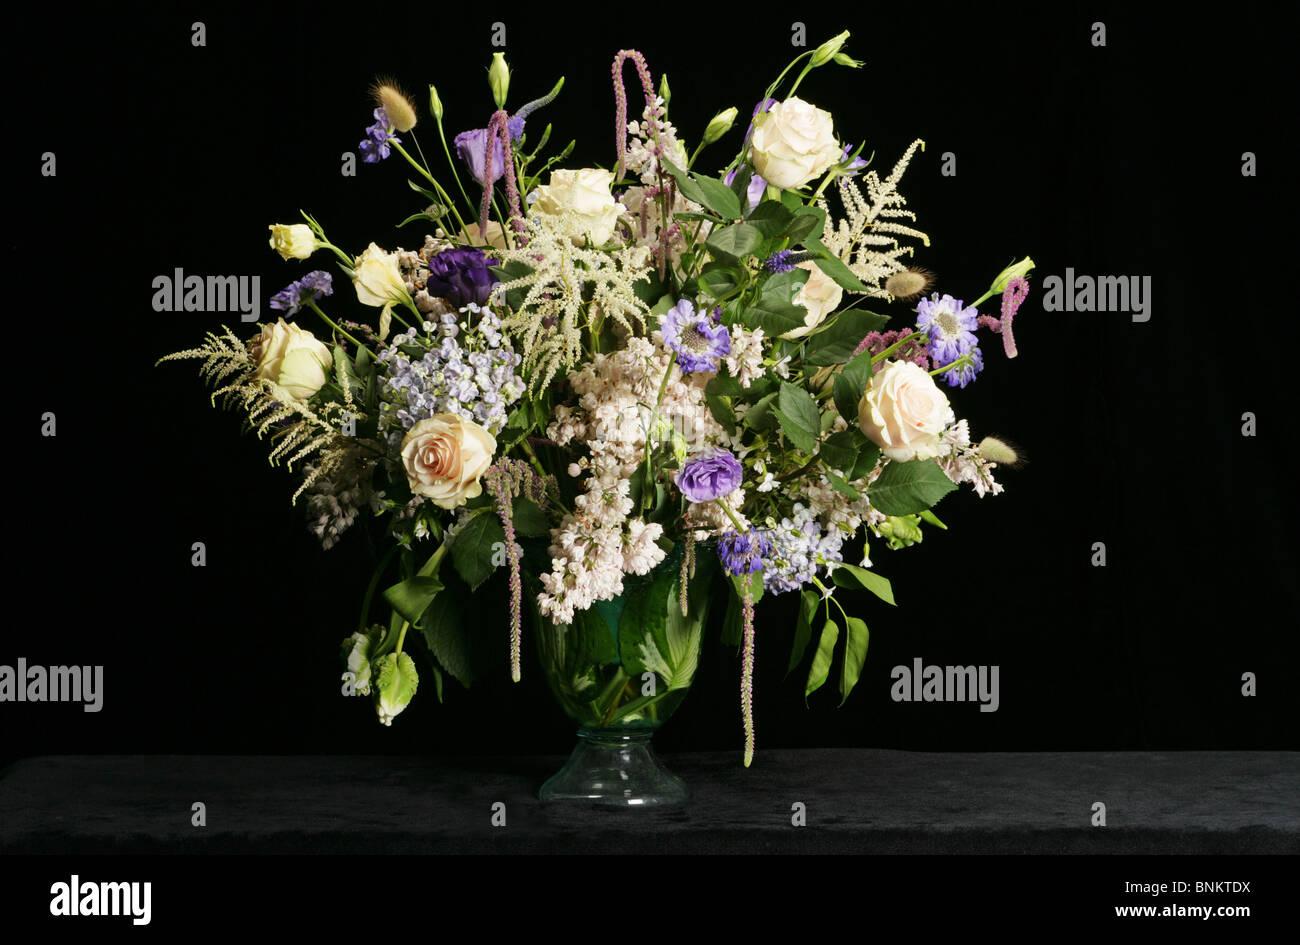 White purple flower arrangement stock photo 30554438 alamy white purple flower arrangement mightylinksfo